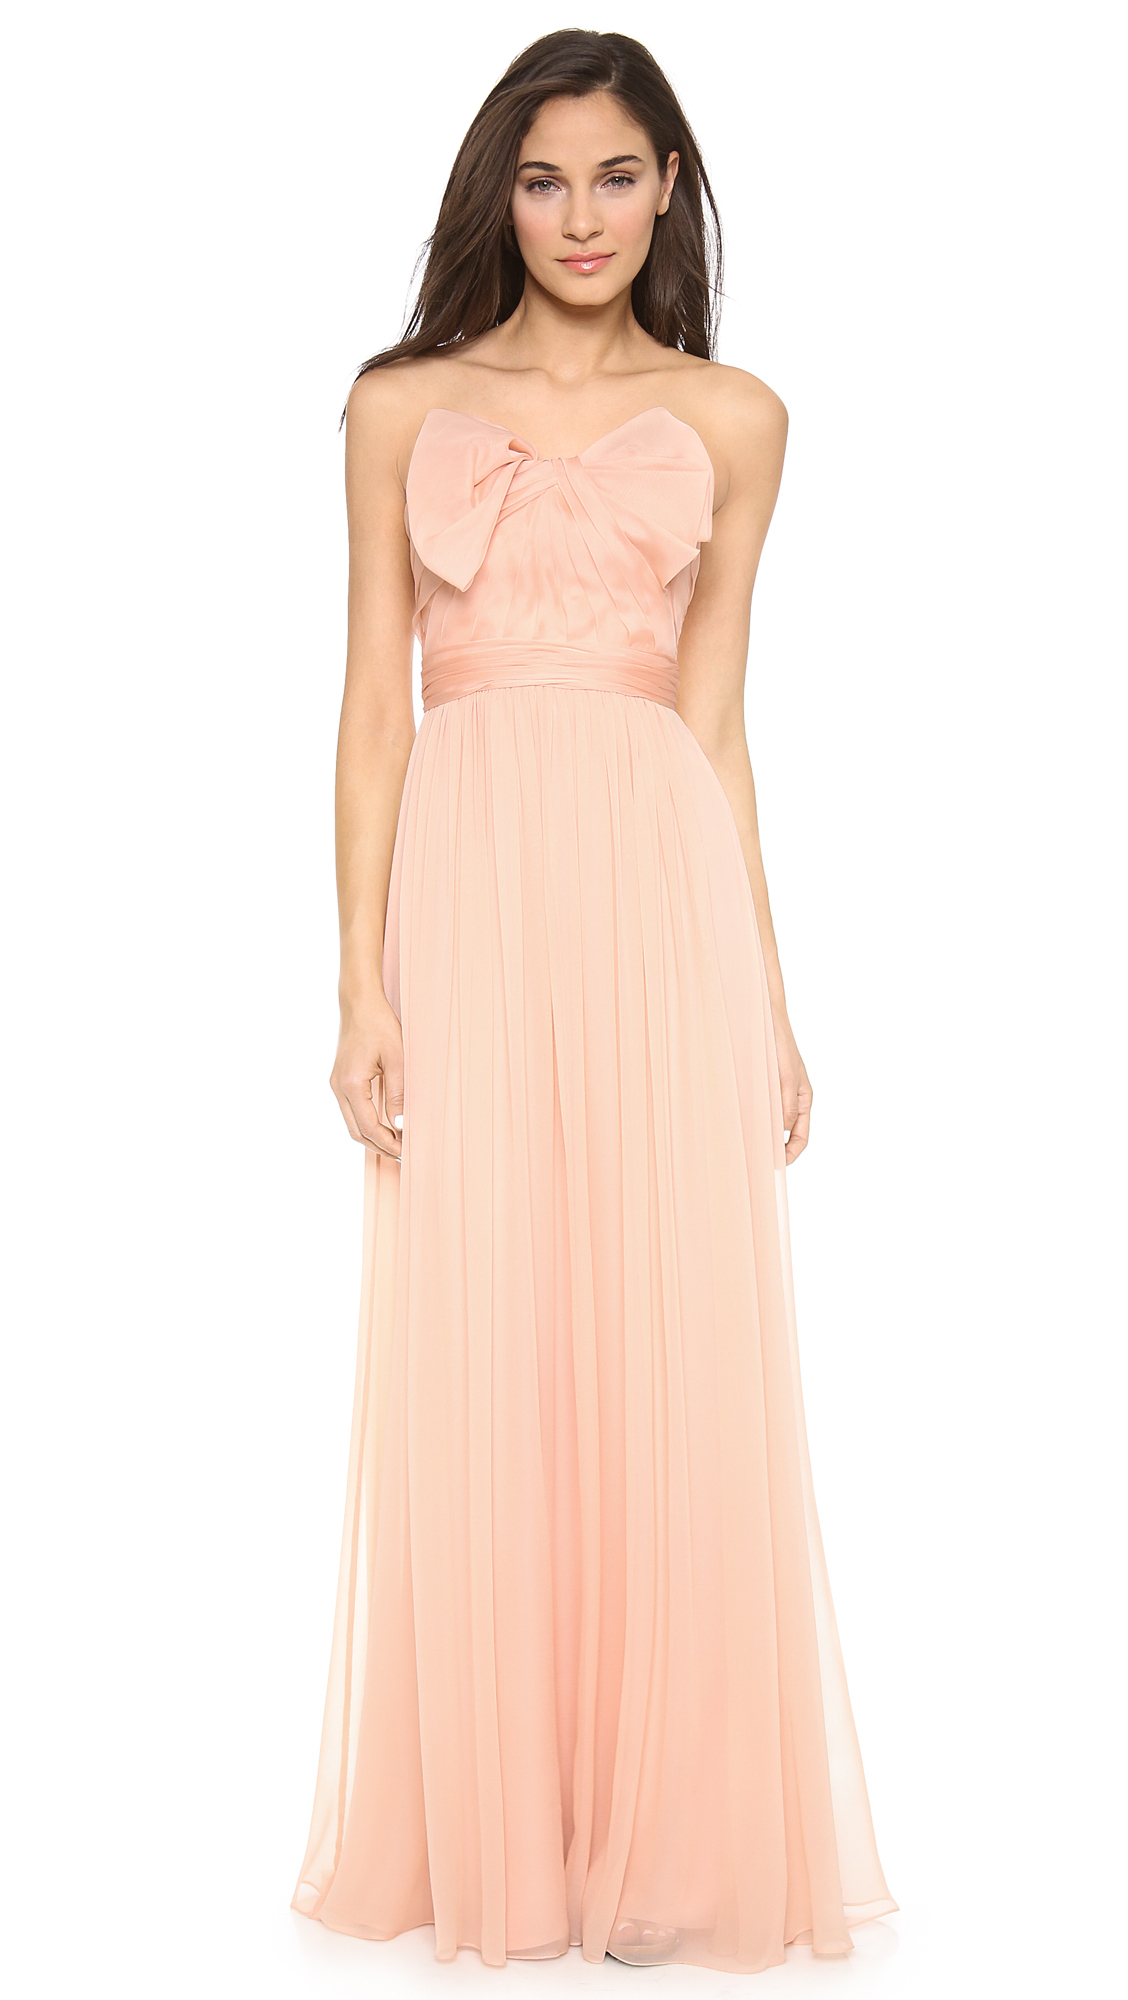 Marchesa Pink Dress  Cocktail Dresses 2016